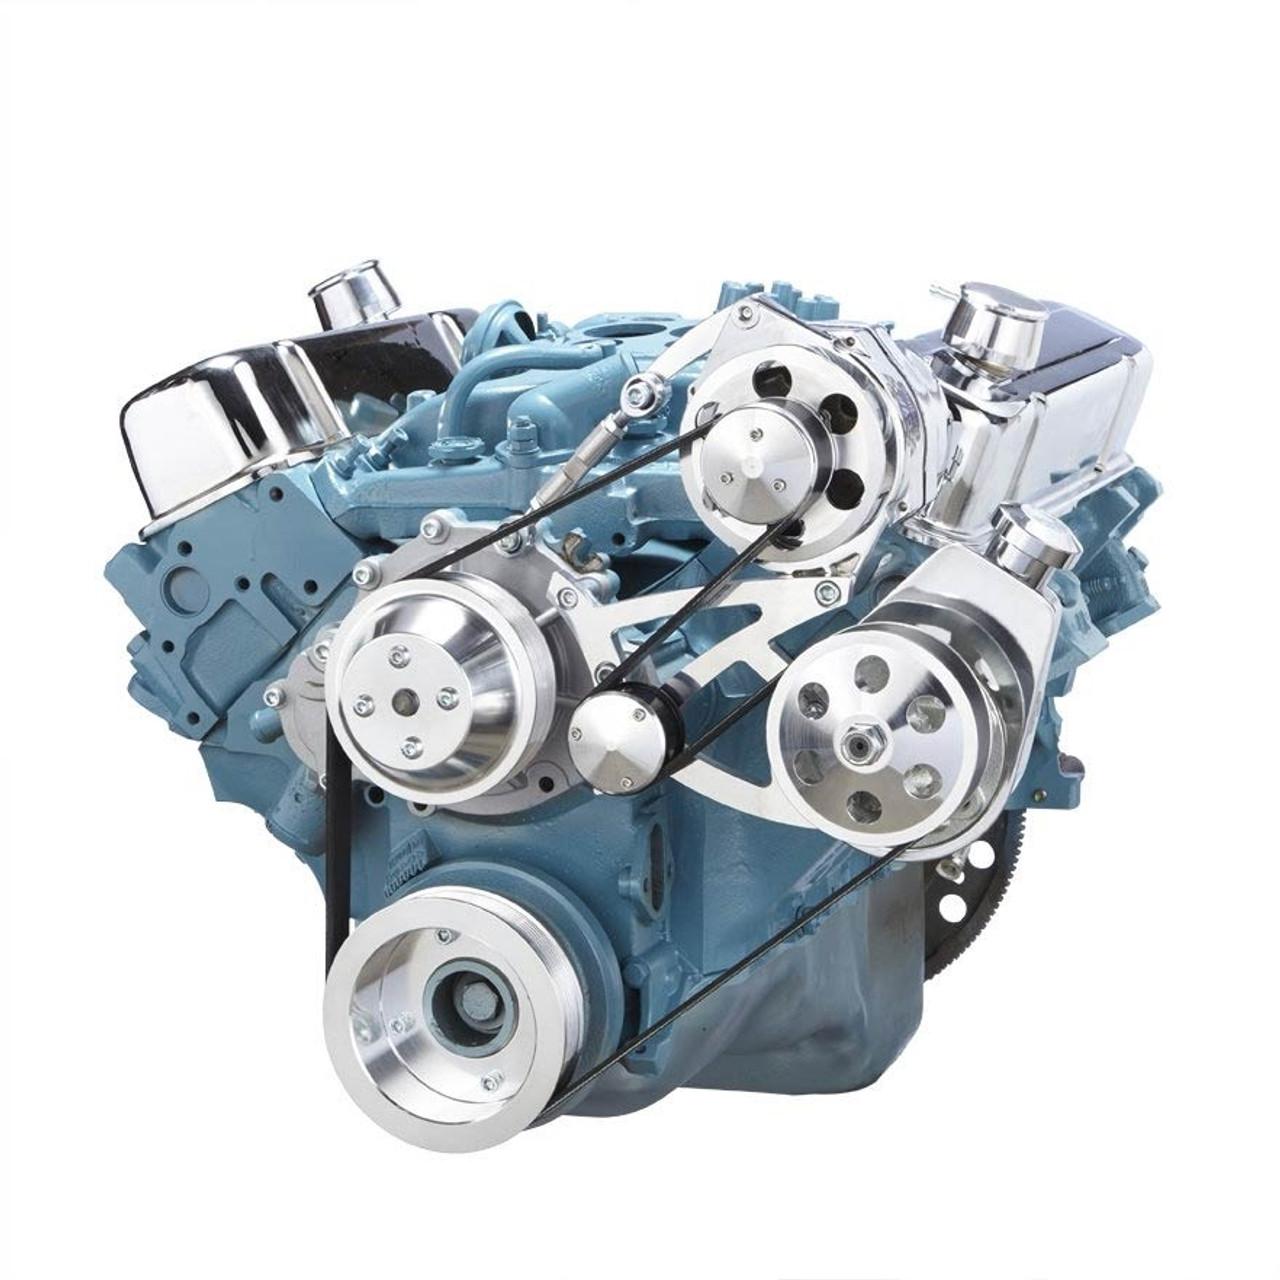 pontiac serpentine conversion kit 350 400 428 455 rh cvfracing com 1999 Pontiac Sunfire Parts Diagram Pontiac 3400 Engine Diagram